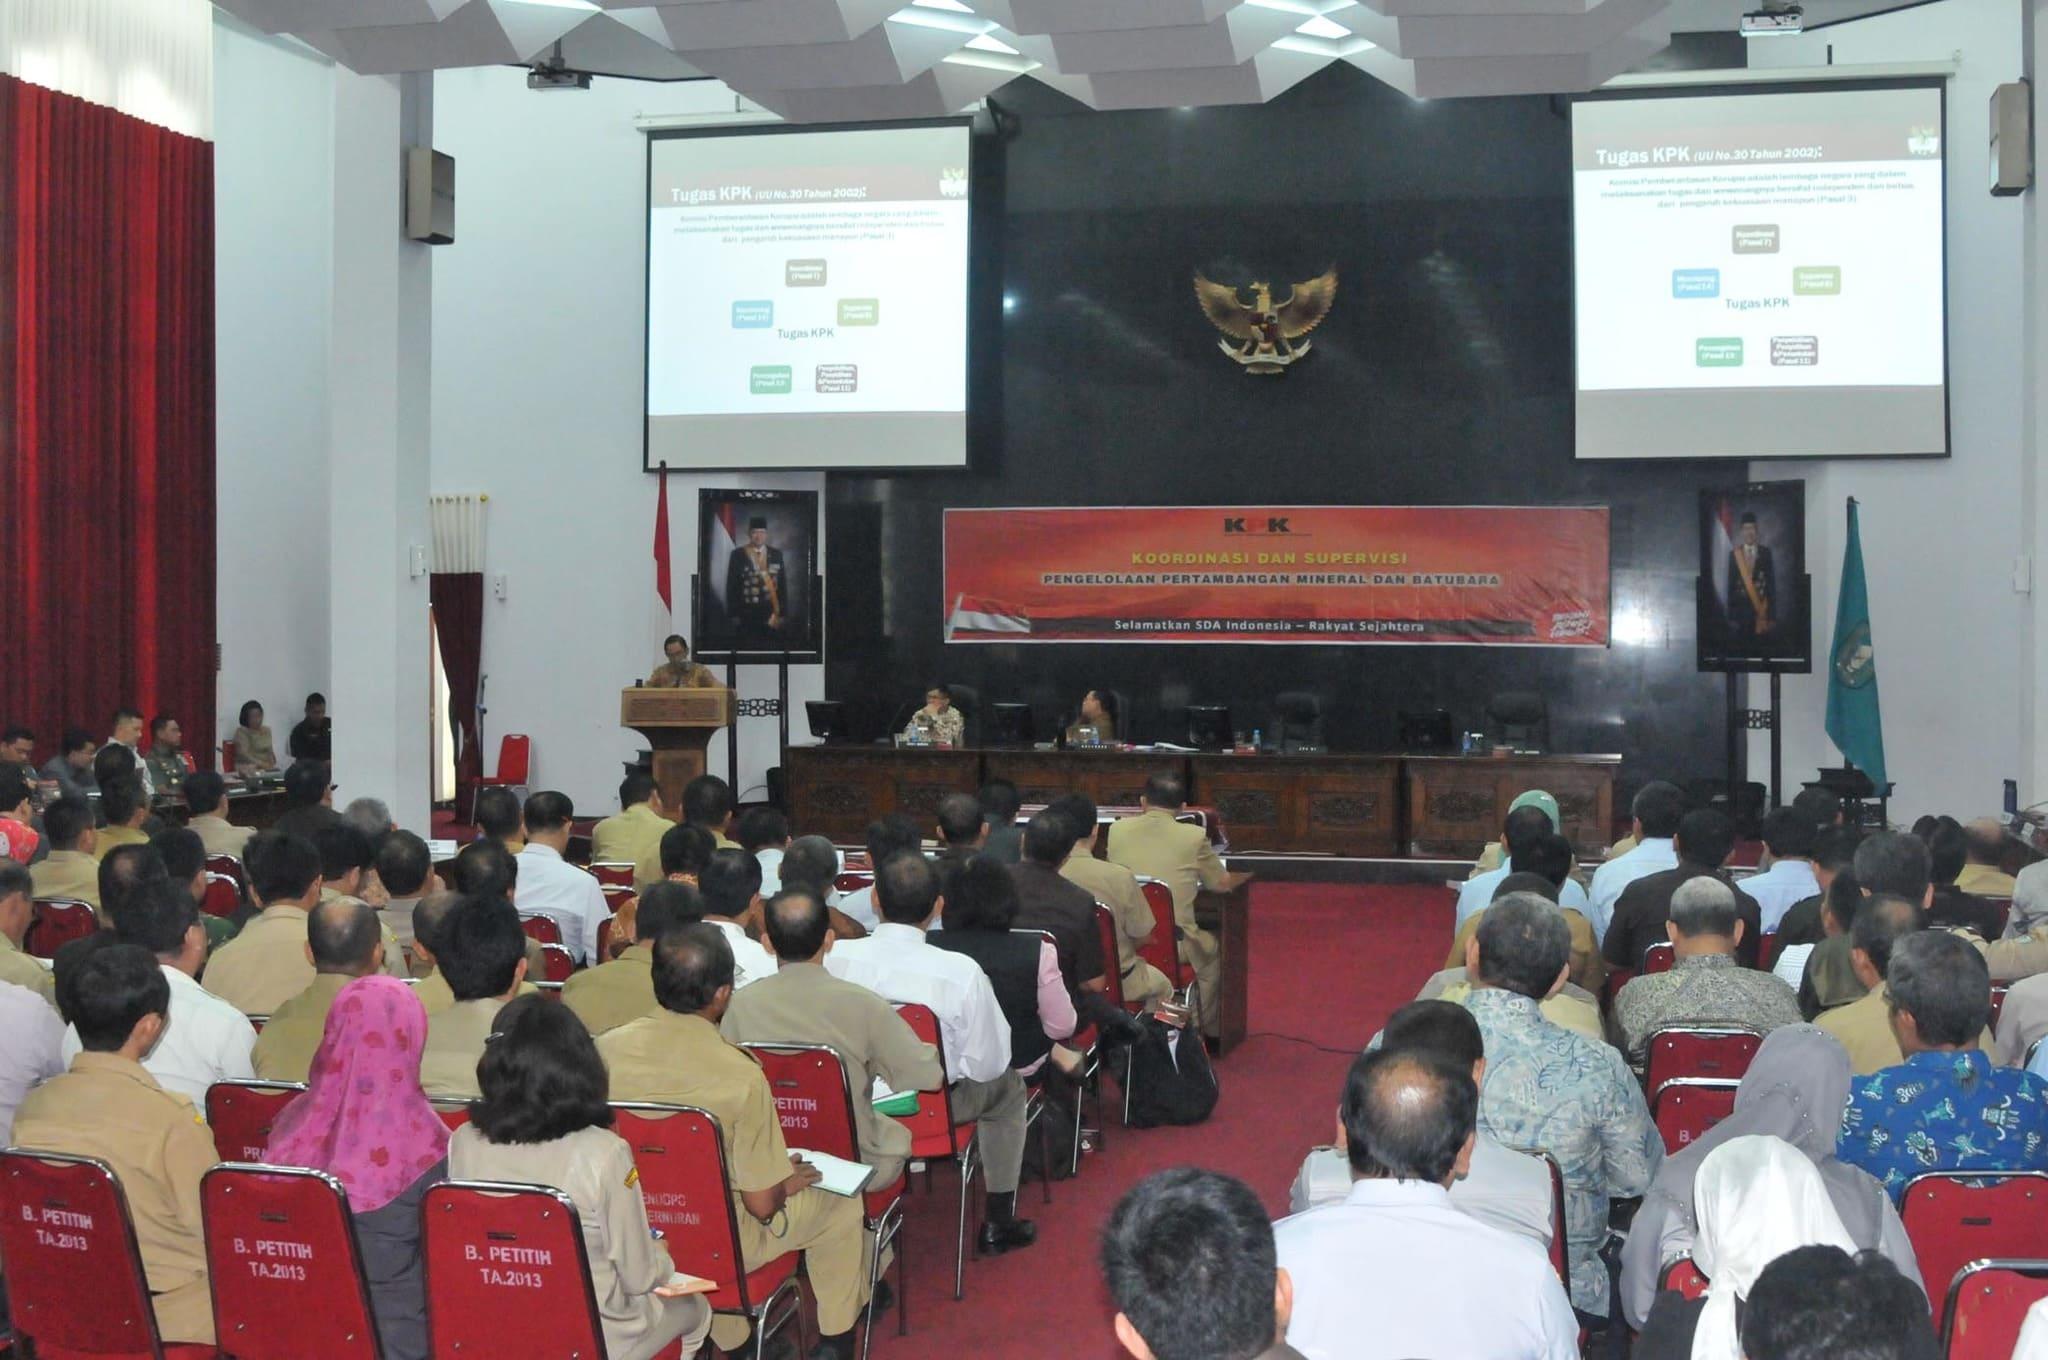 Pangdam XII/Tpr Koordinasi dan Supervisi Pengelolaan Pertambangan Mineral dan Batubara Provinsi Kalbar